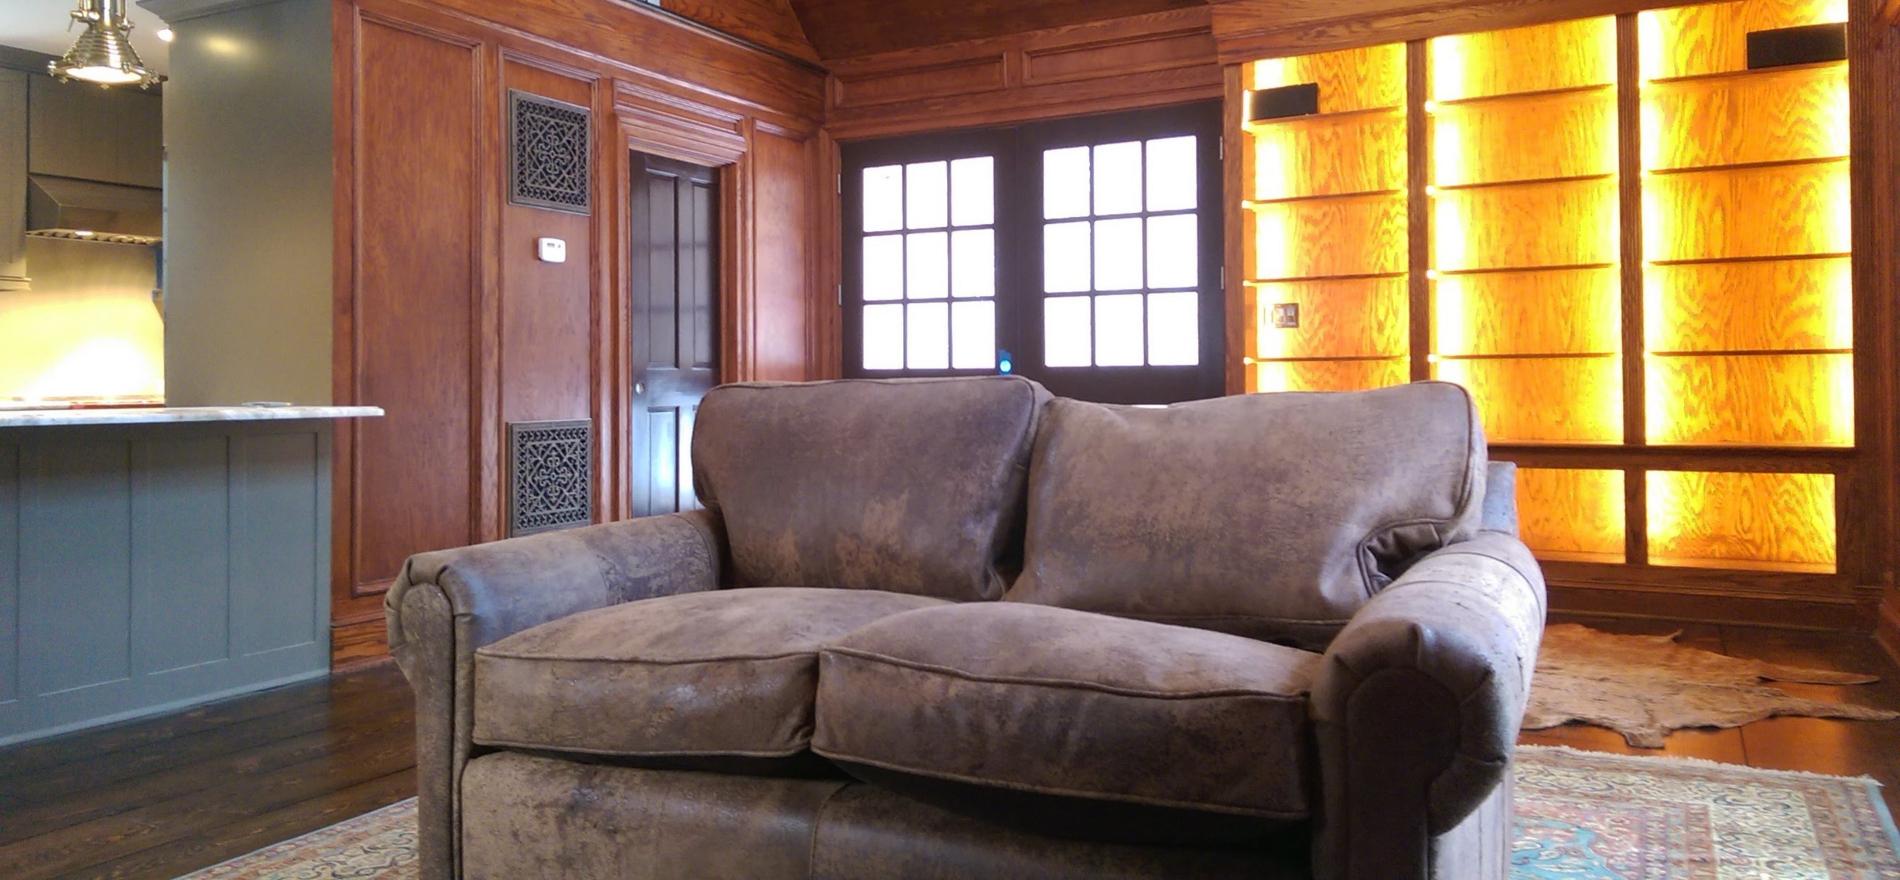 Interior21 Interior Renovation Photos